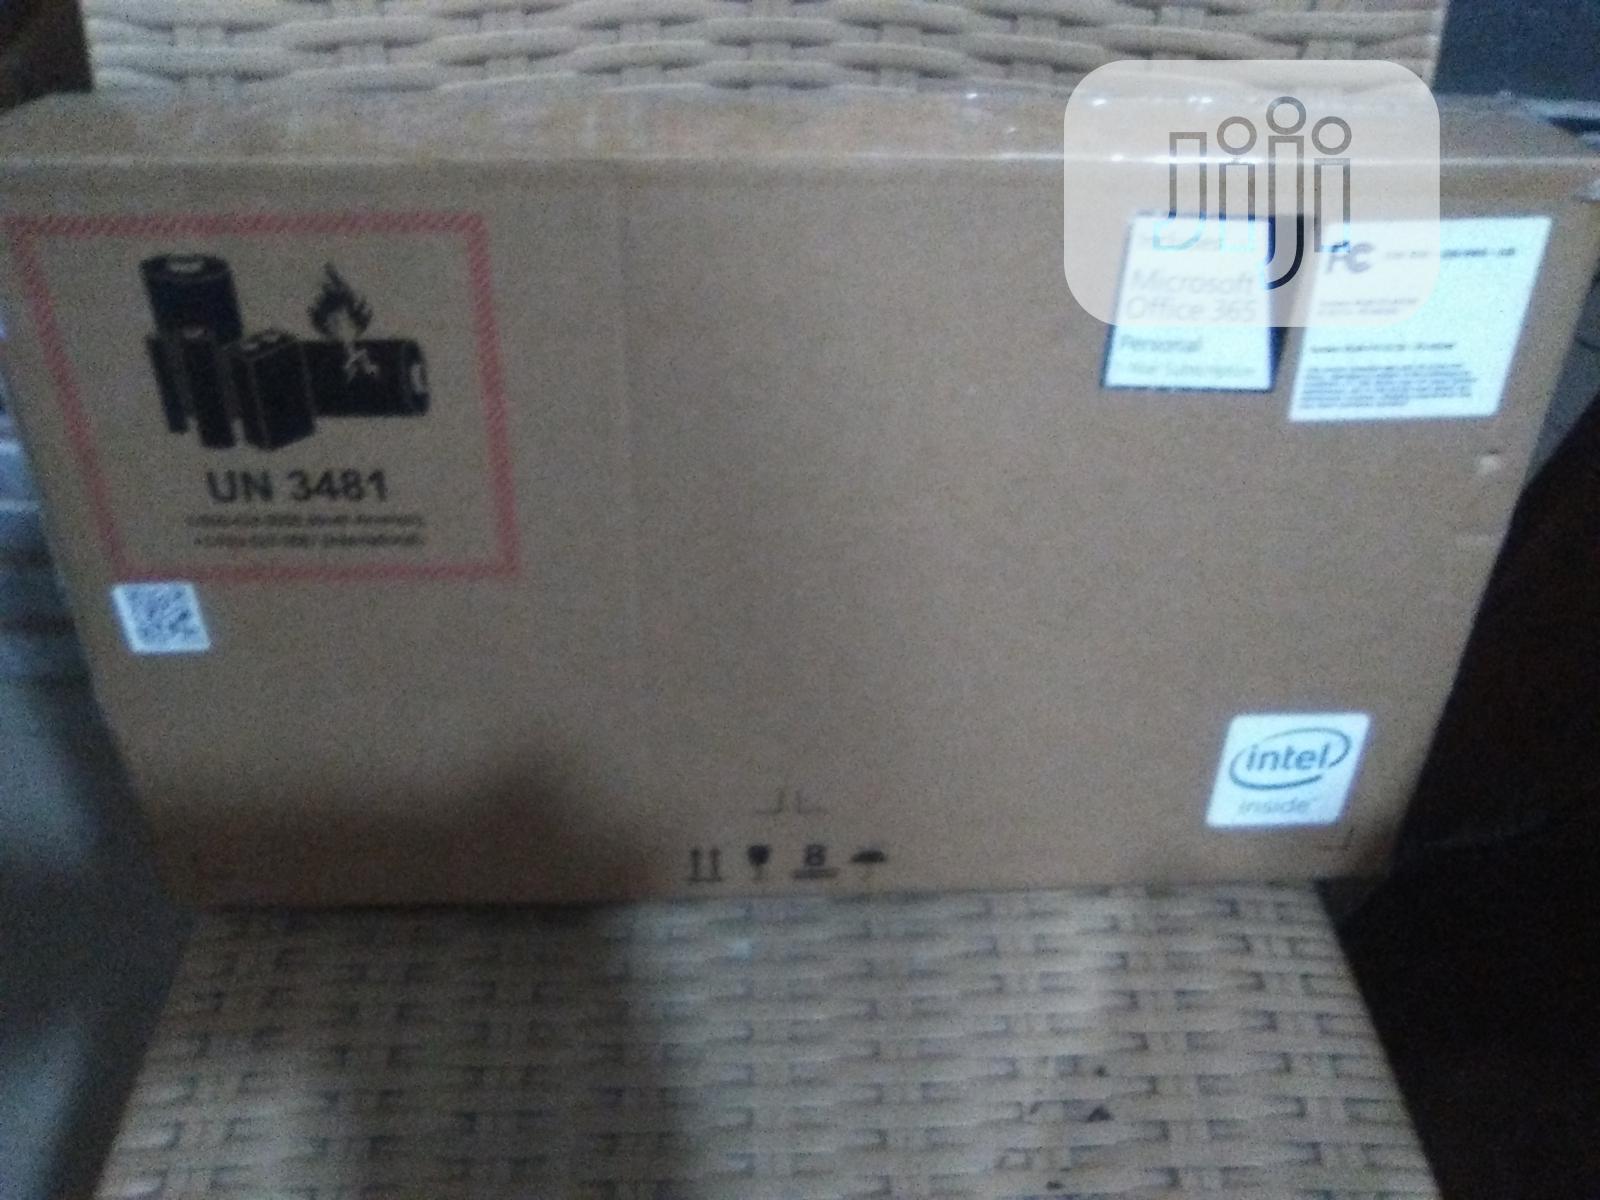 New Laptop HP Stream 11-ah110hr 4GB Intel Celeron SSD 60GB | Laptops & Computers for sale in Ikeja, Lagos State, Nigeria